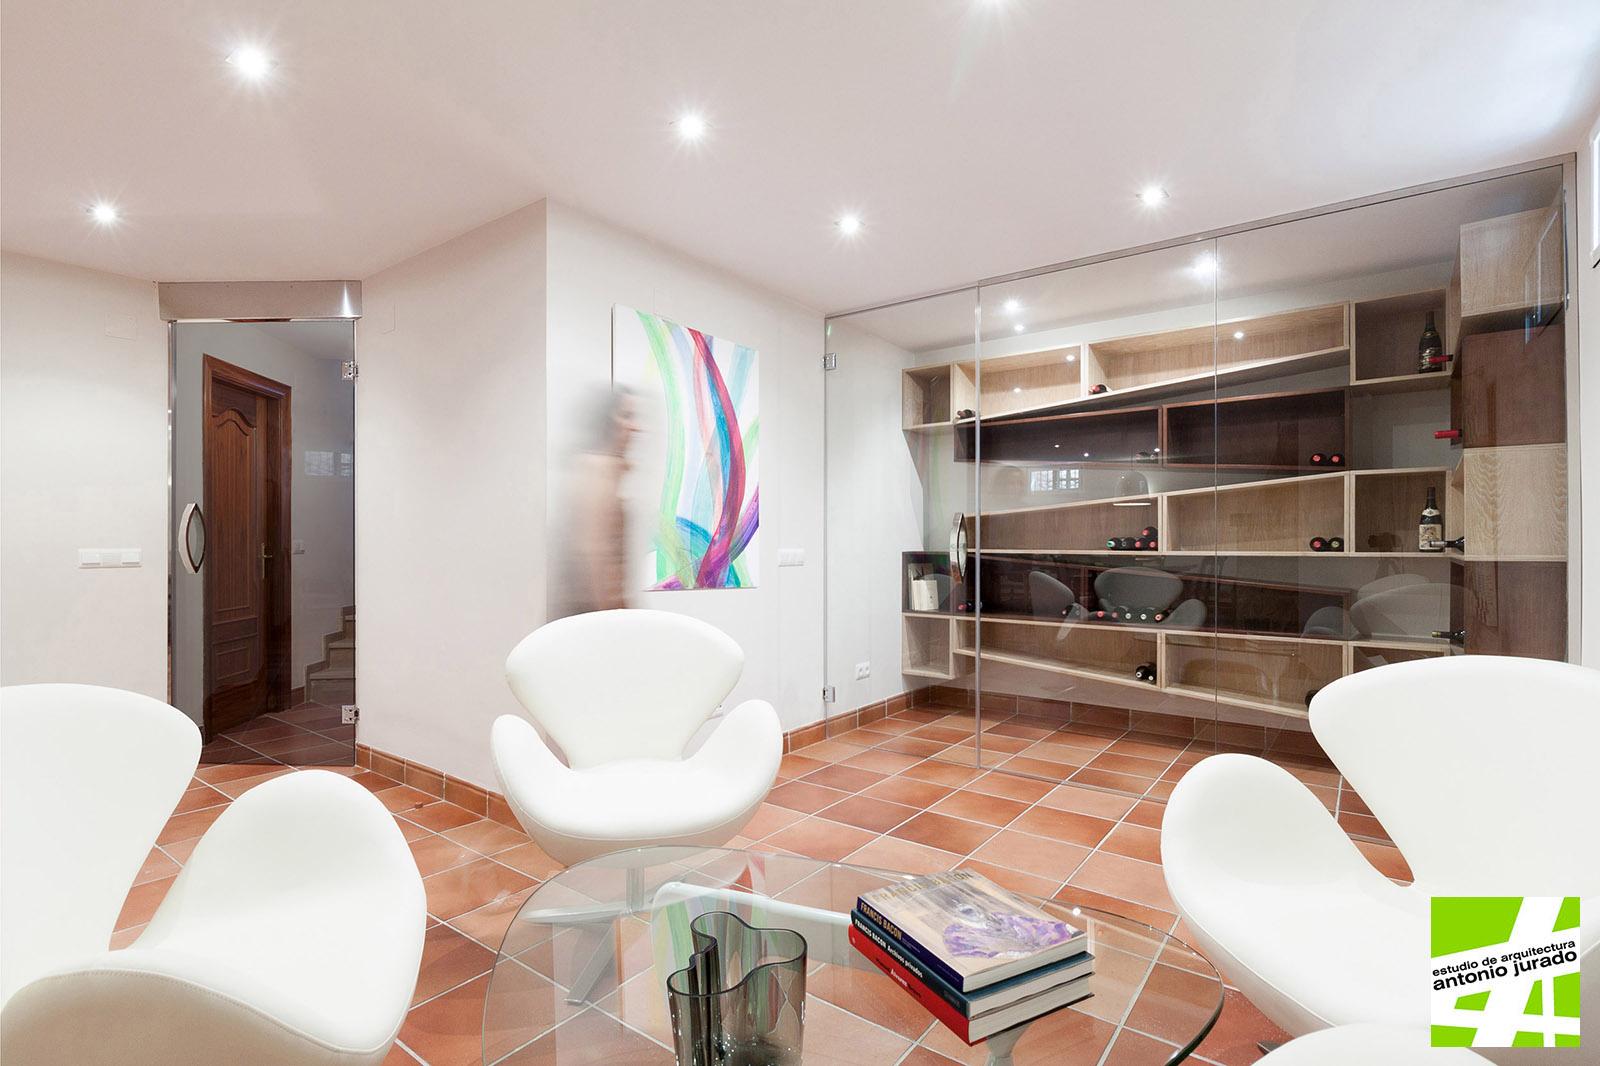 interiorismo-reforma-diseño-vivienda-torrox-park-malaga-antonio-jurado-arquitecto-02